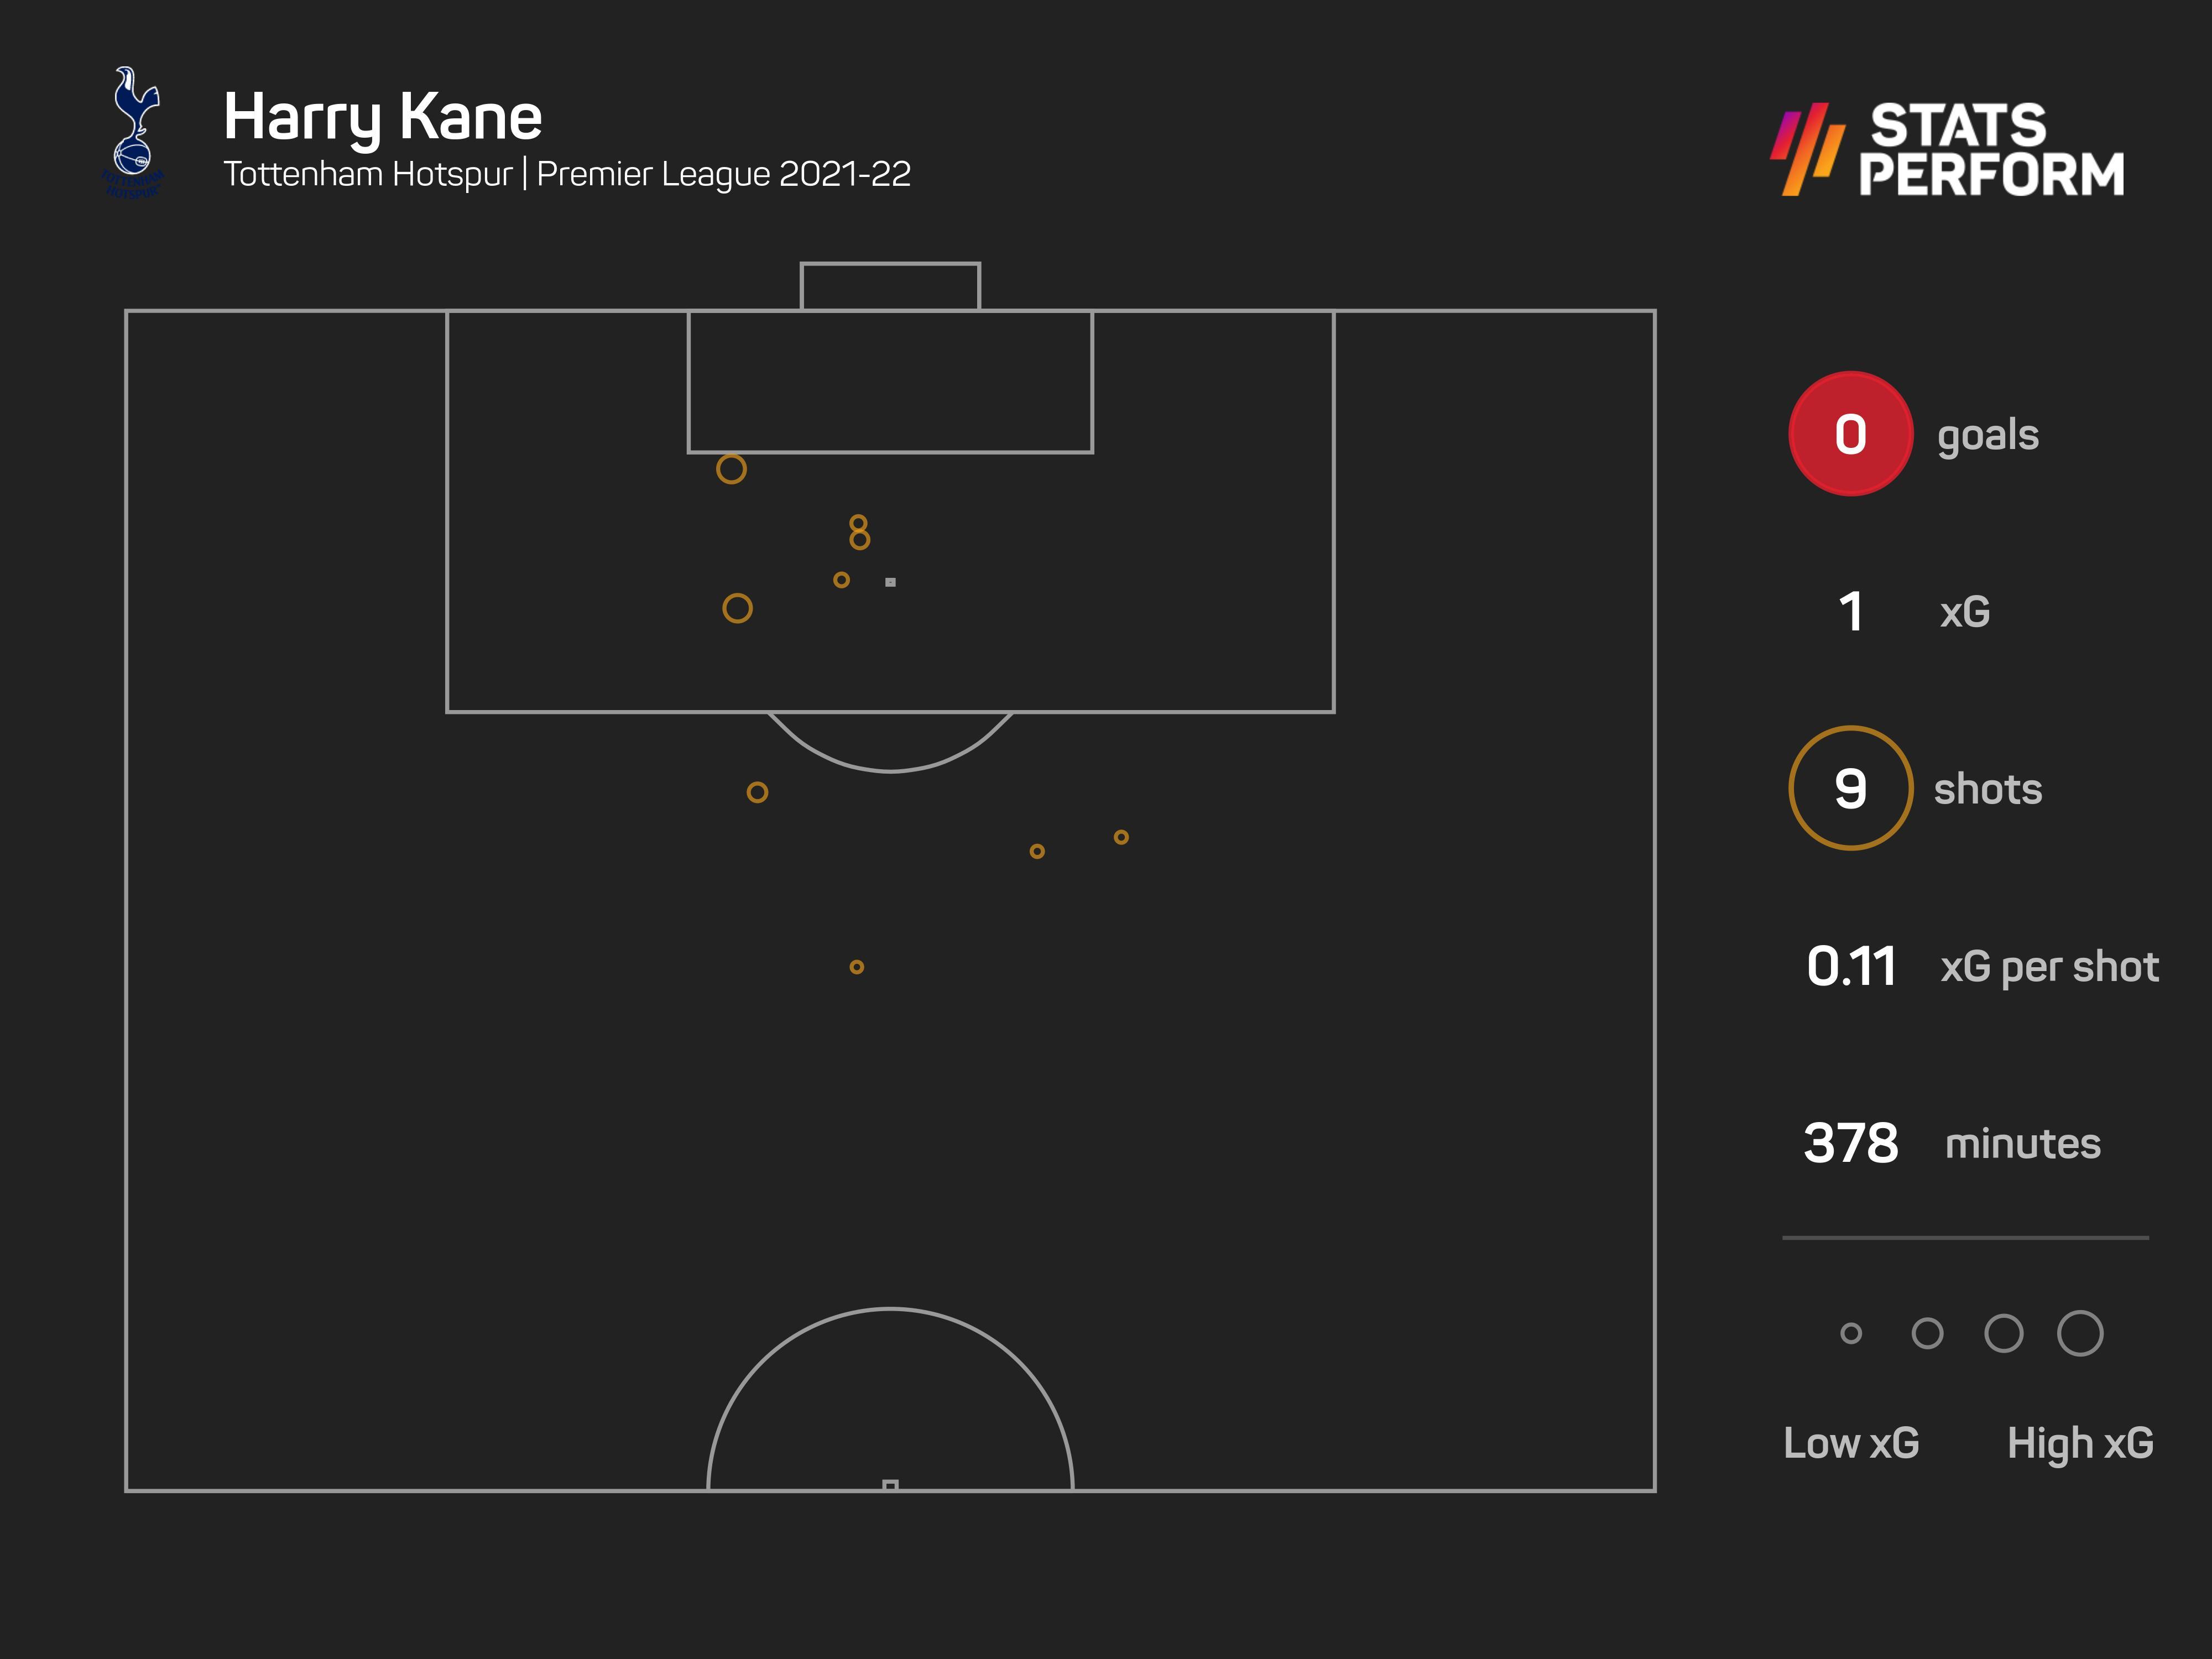 Harry Kane is yet to score this season